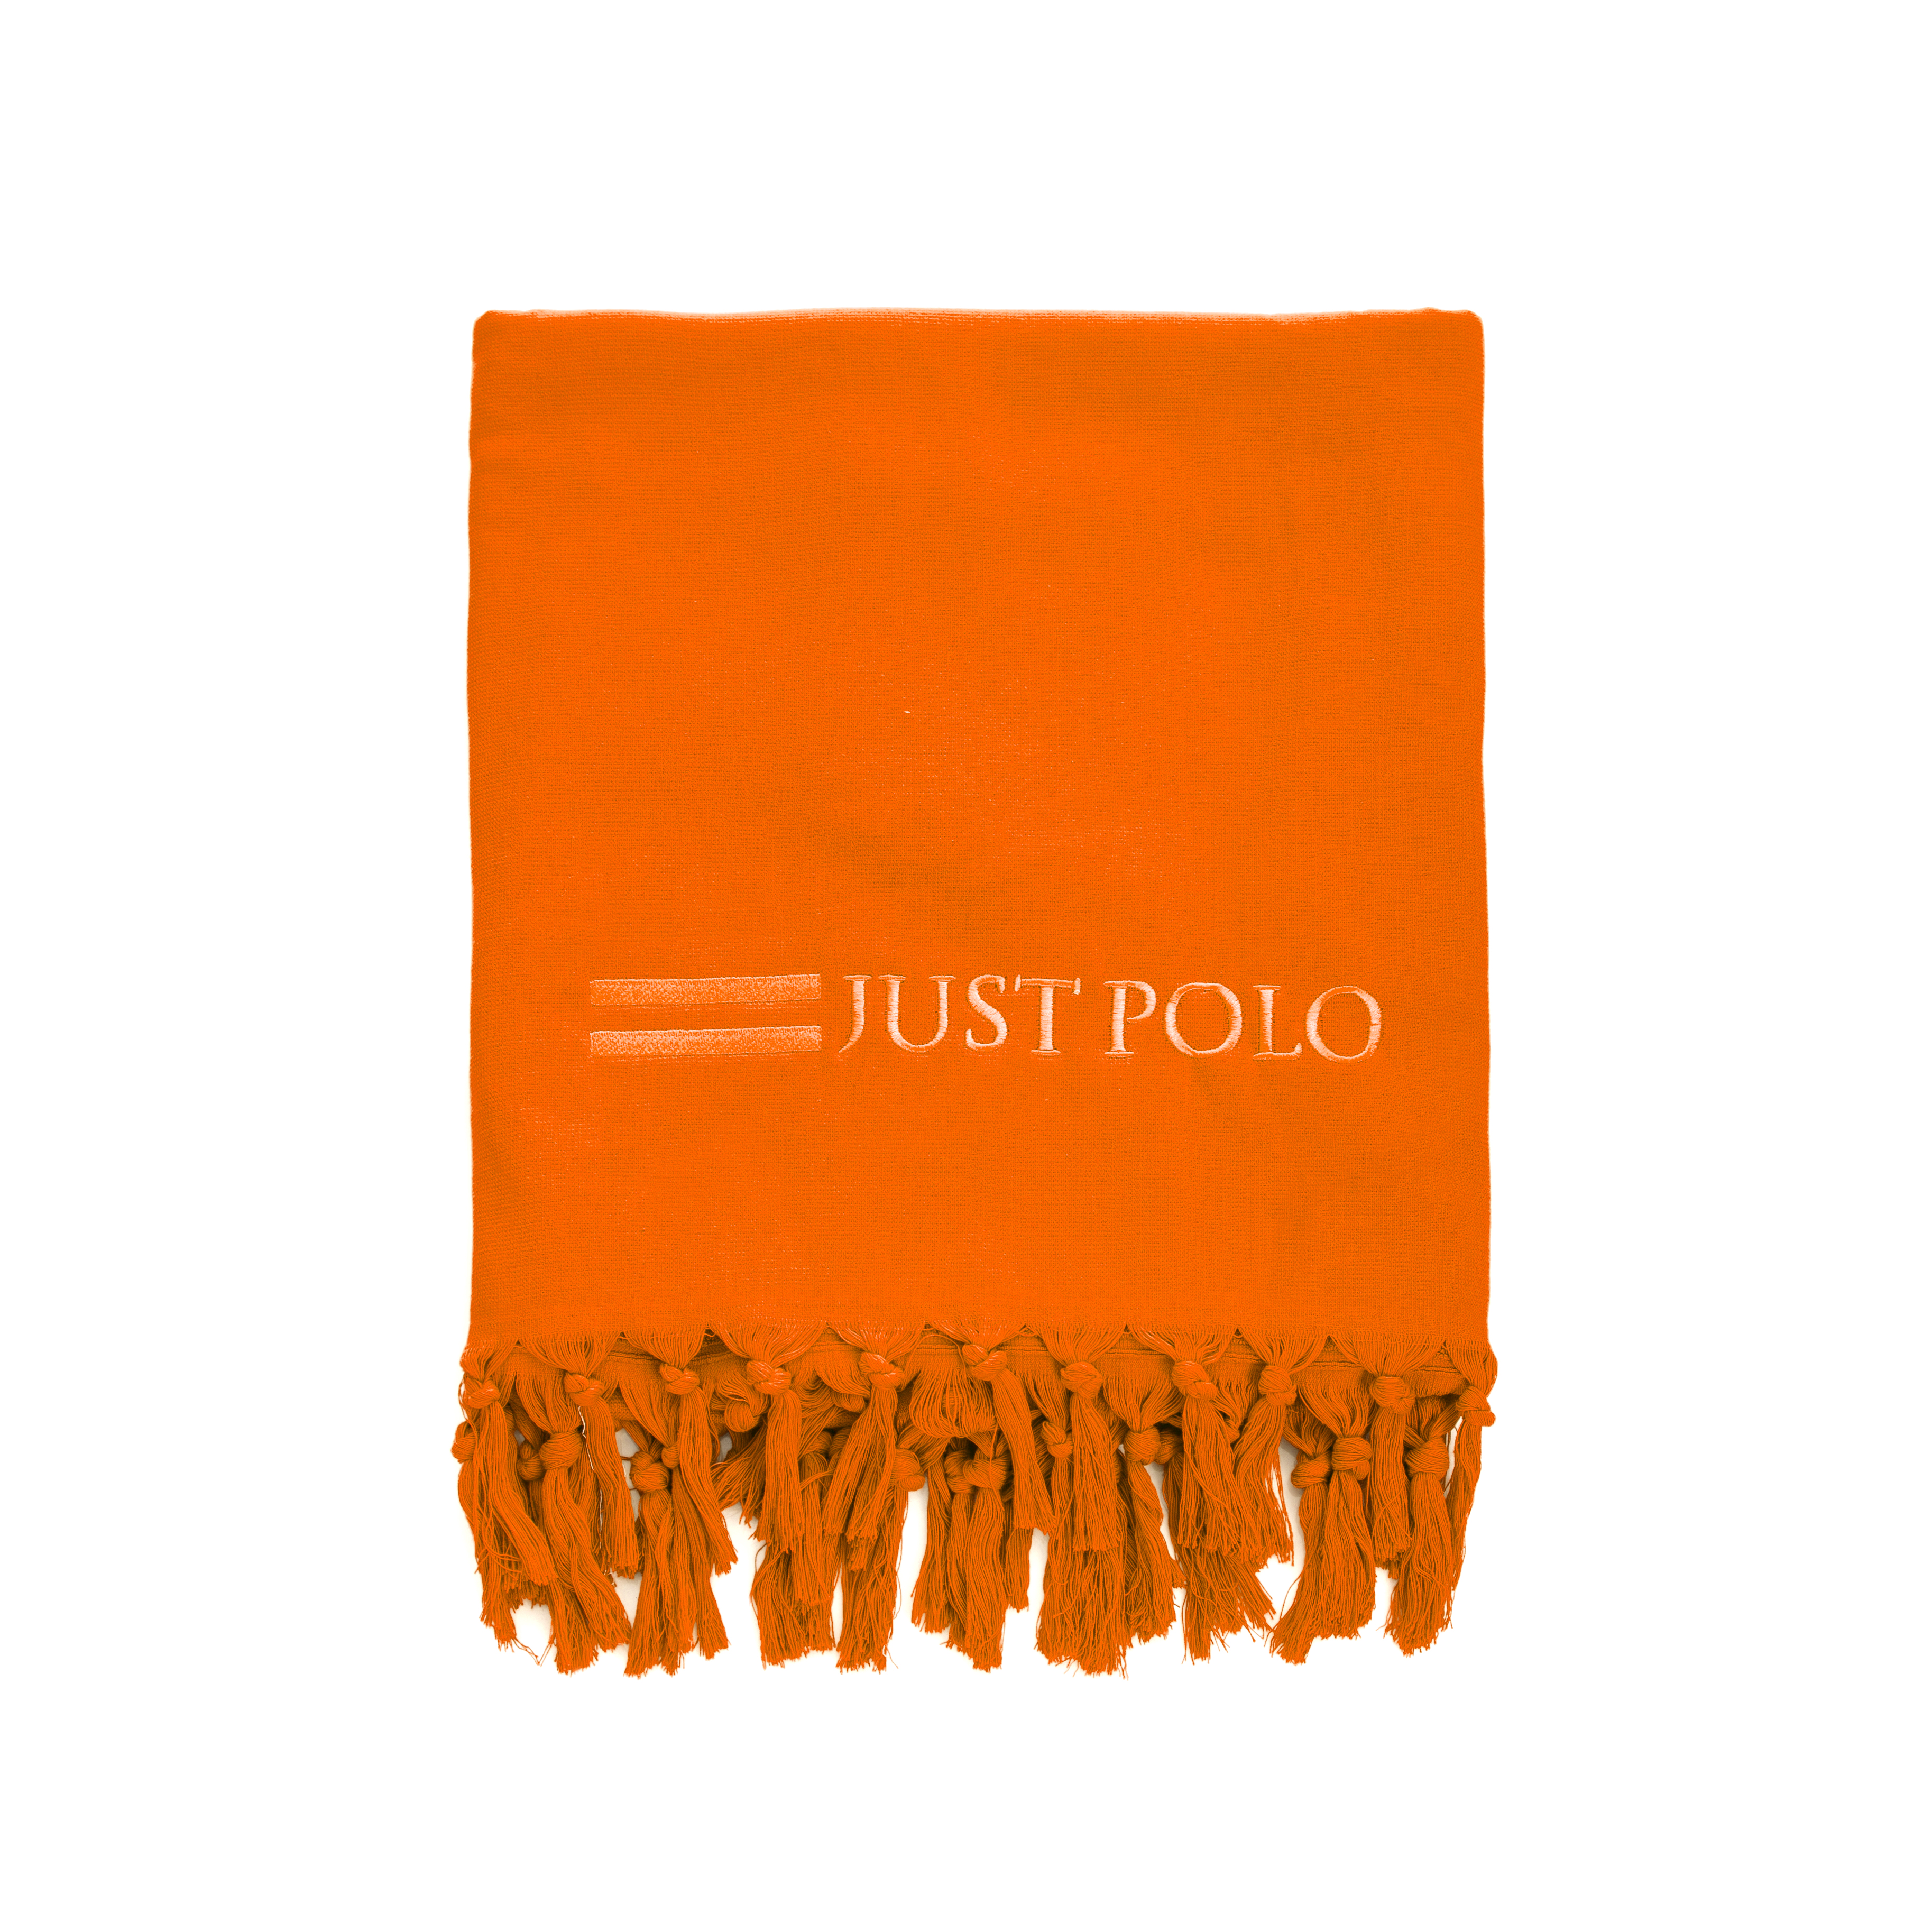 JUST POLO – Πετσέτα θαλάσσης Just Polo πορτοκαλί